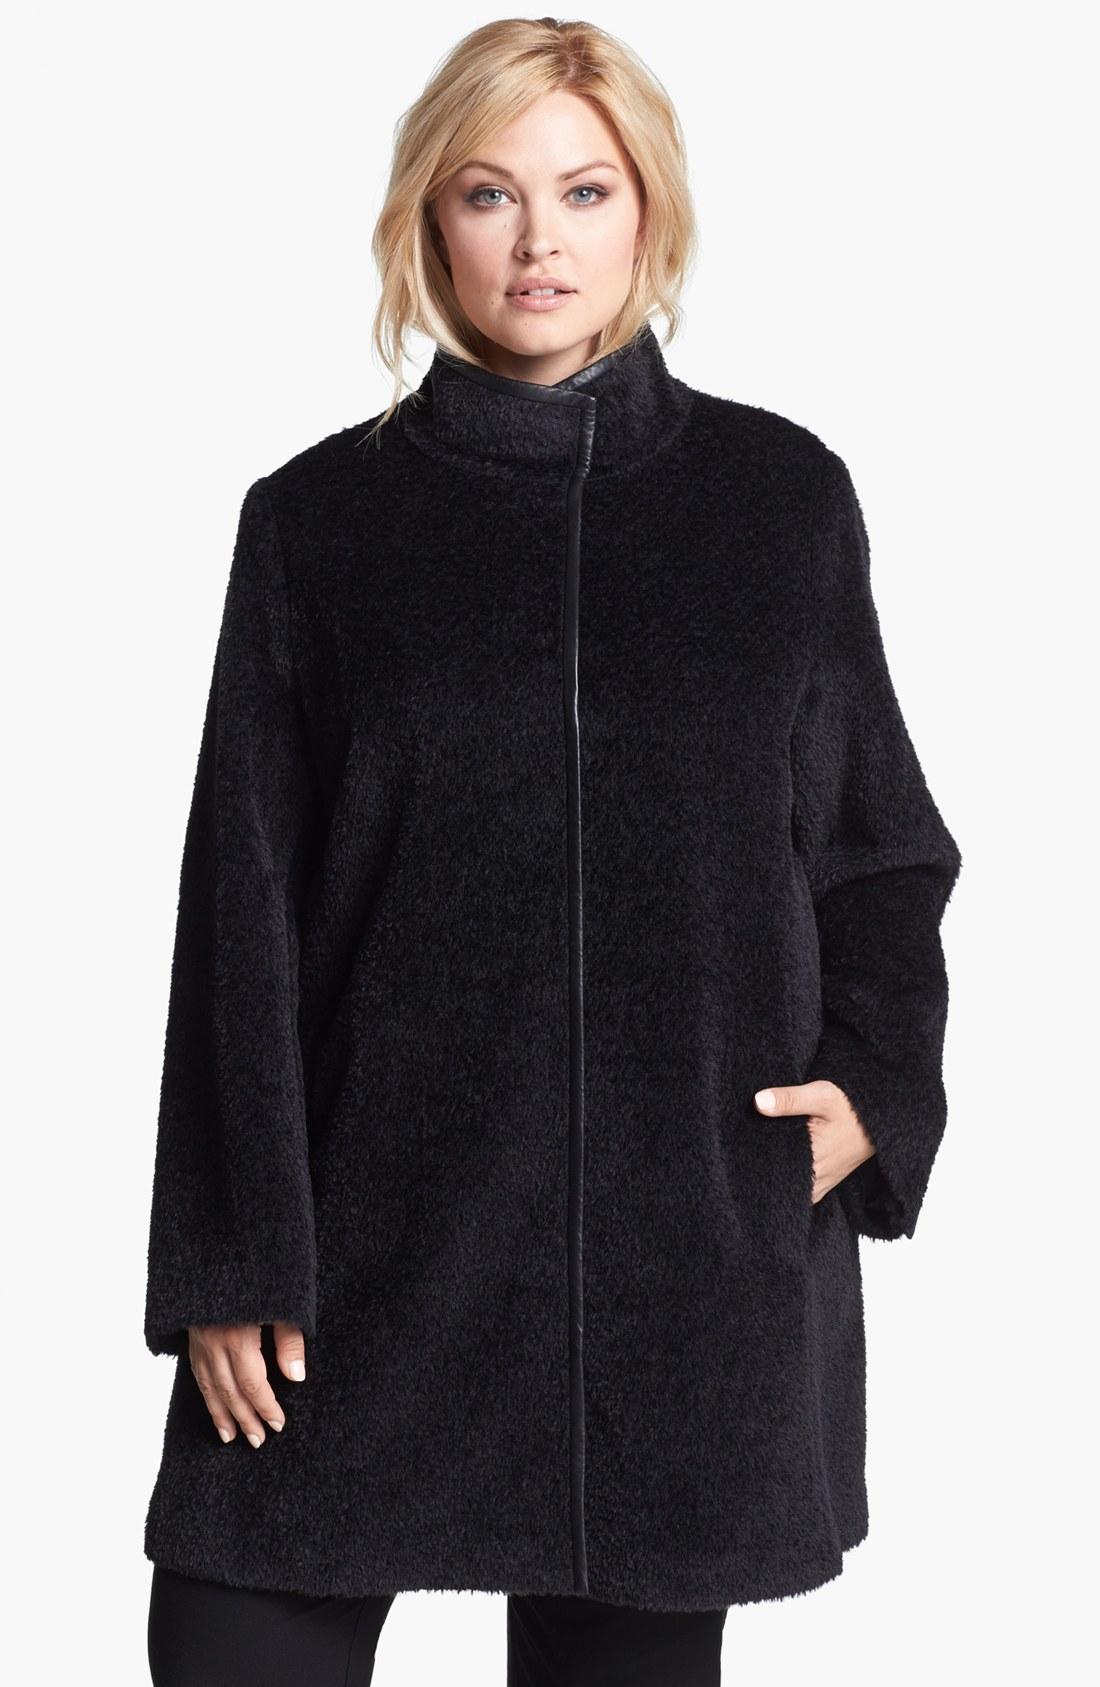 Eileen Fisher Leather Trim Alpaca Wool Blend Coat In Black